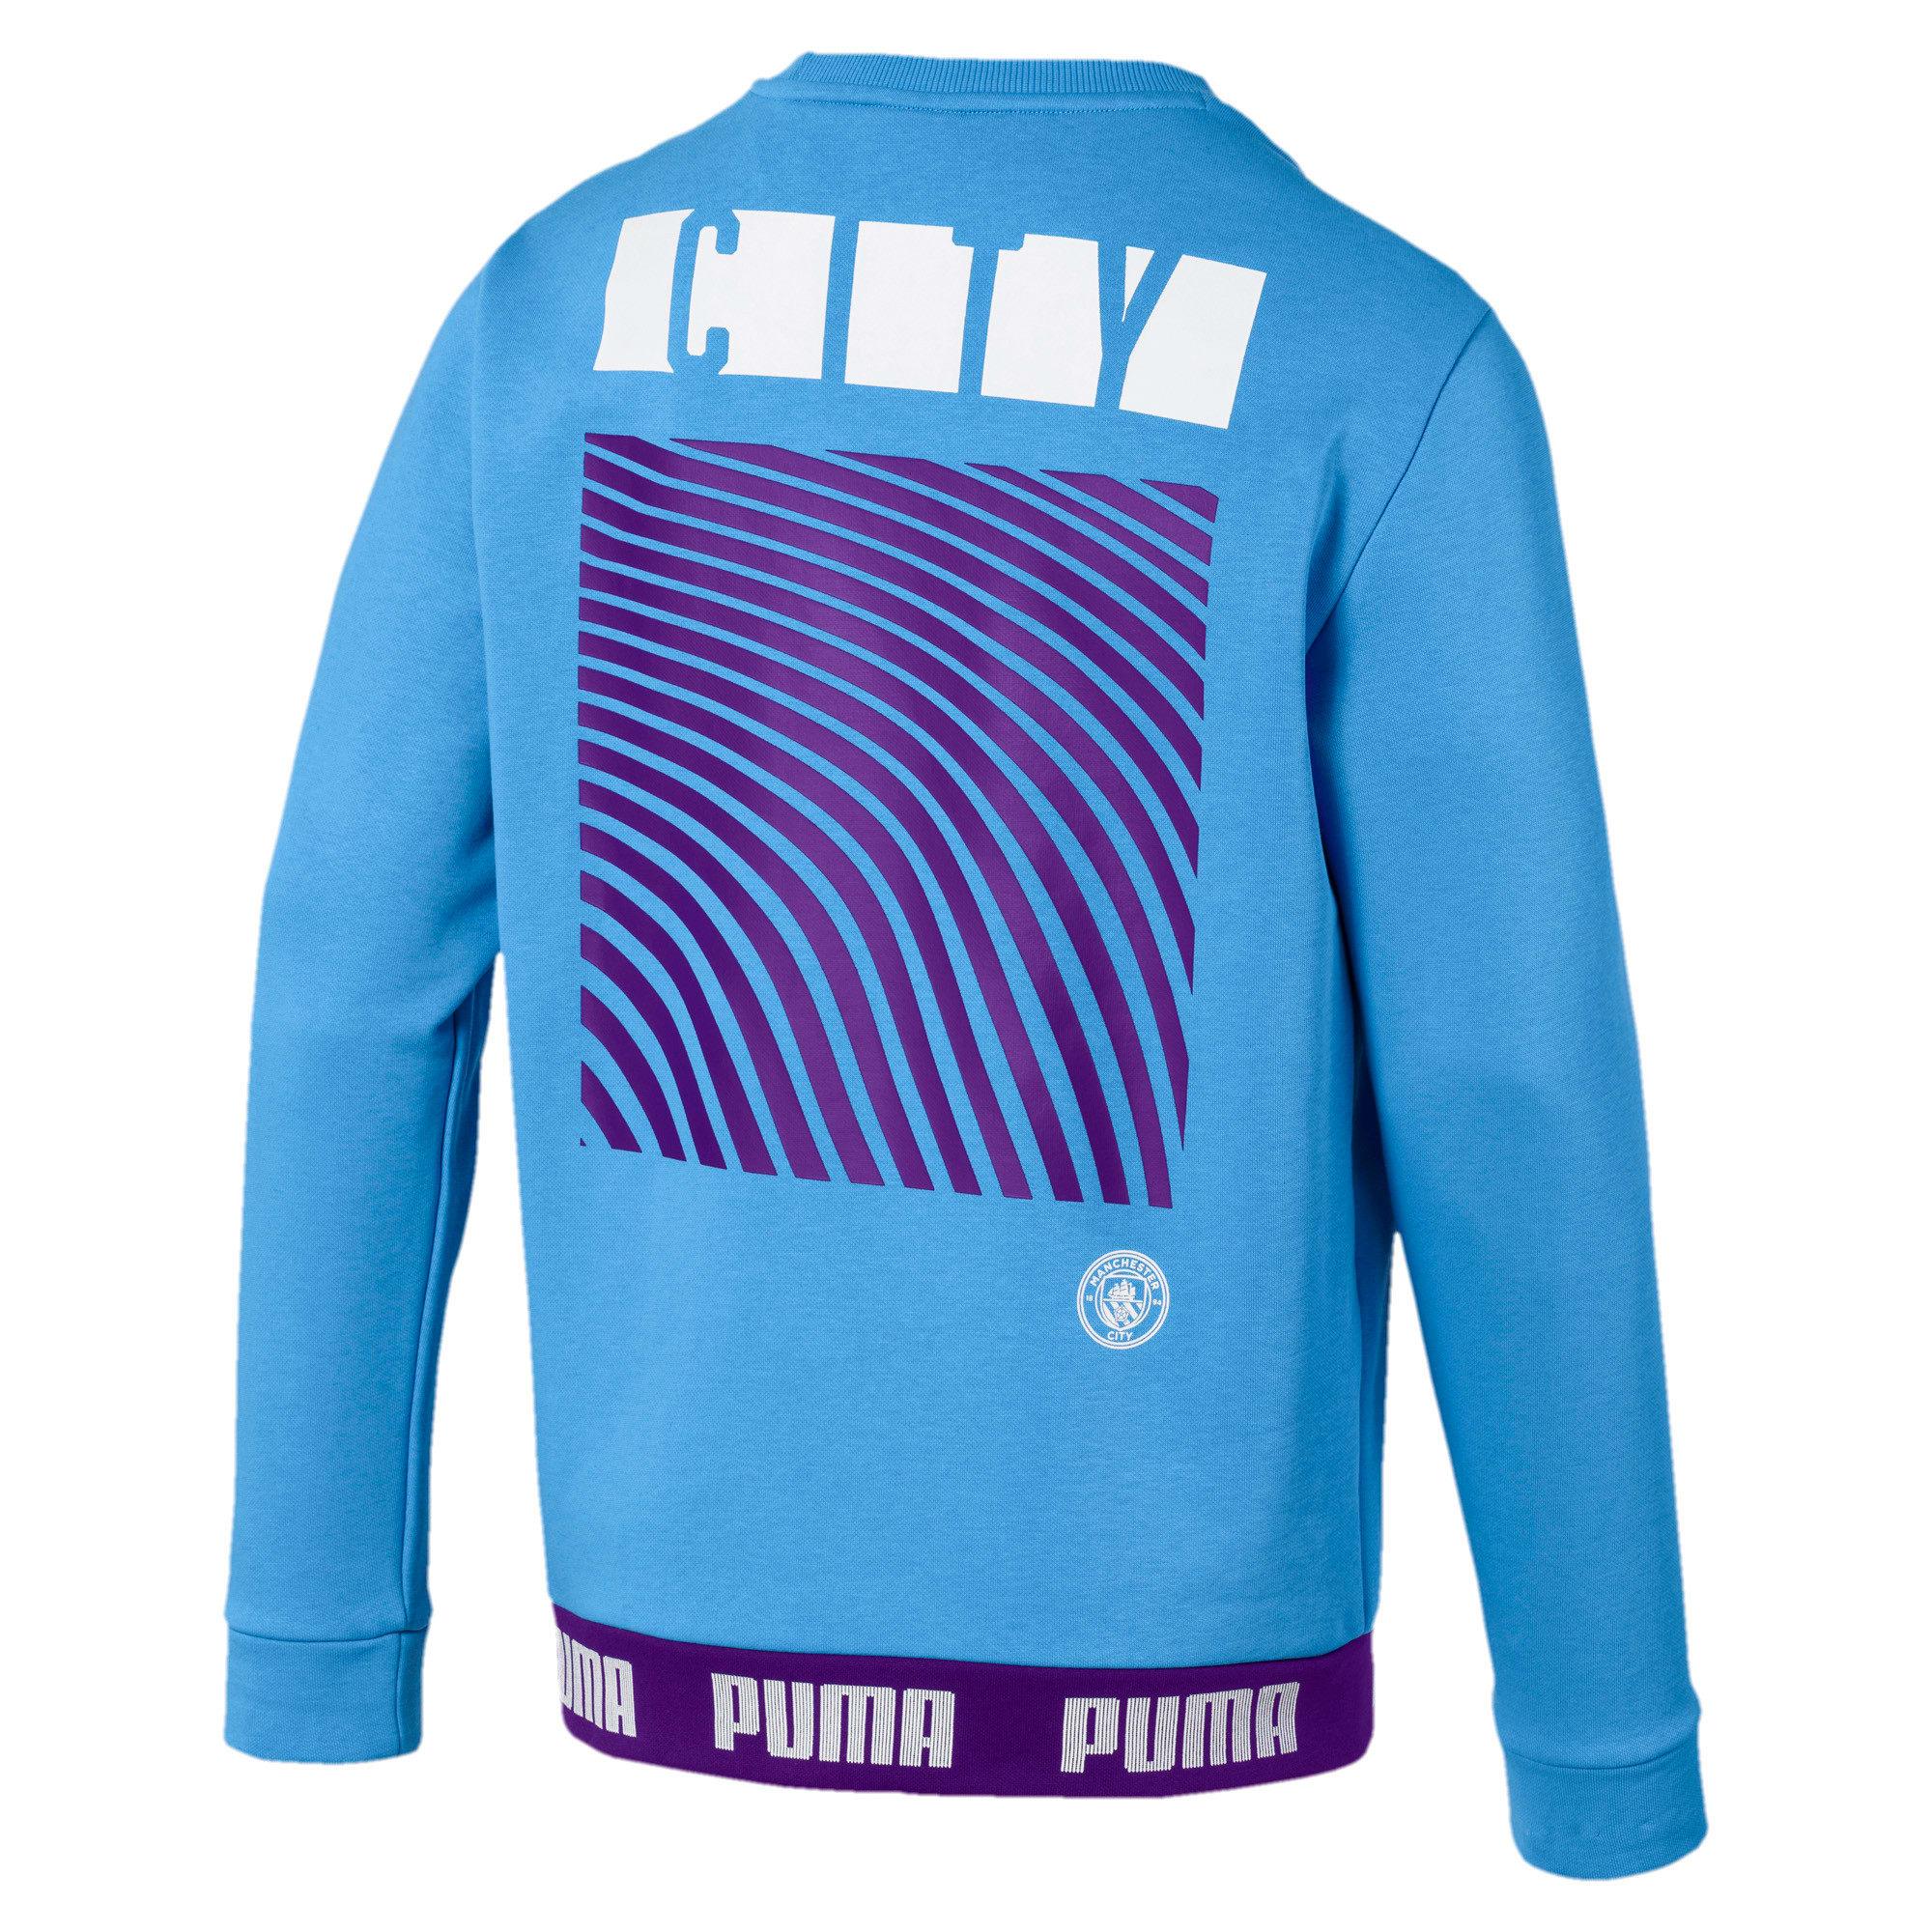 Thumbnail 2 of Manchester City Football Culture Herren Sweatshirt, Team Light Blue-Puma White, medium